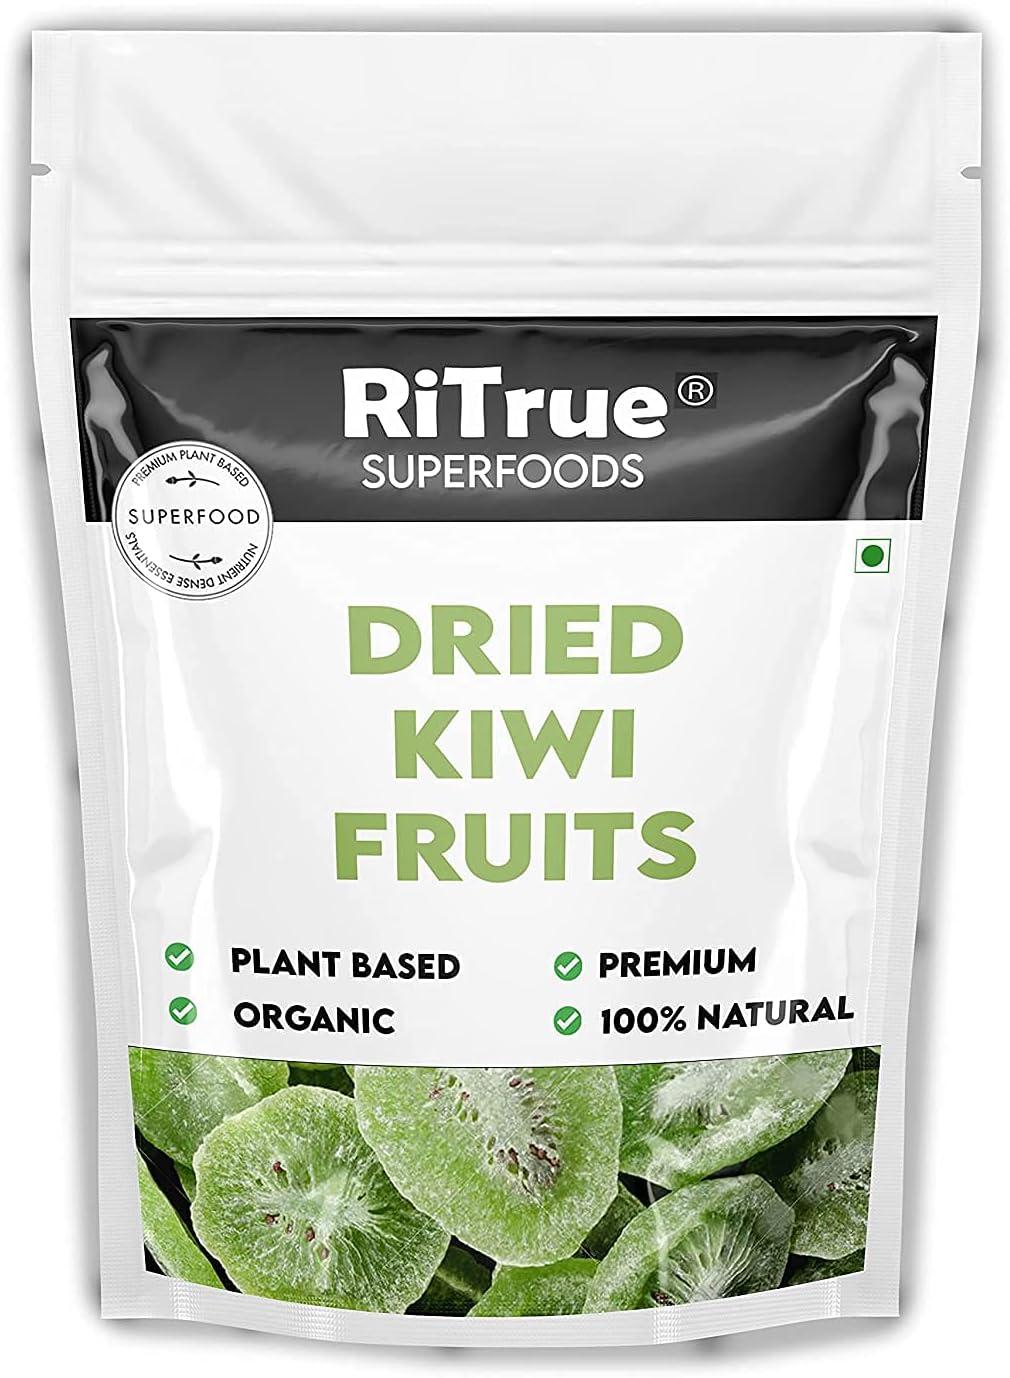 Bluenile RiTrue - Organic Dried Kiwi 800 Jumbo Pouch Ranking TOP6 Fruit outlet Gm